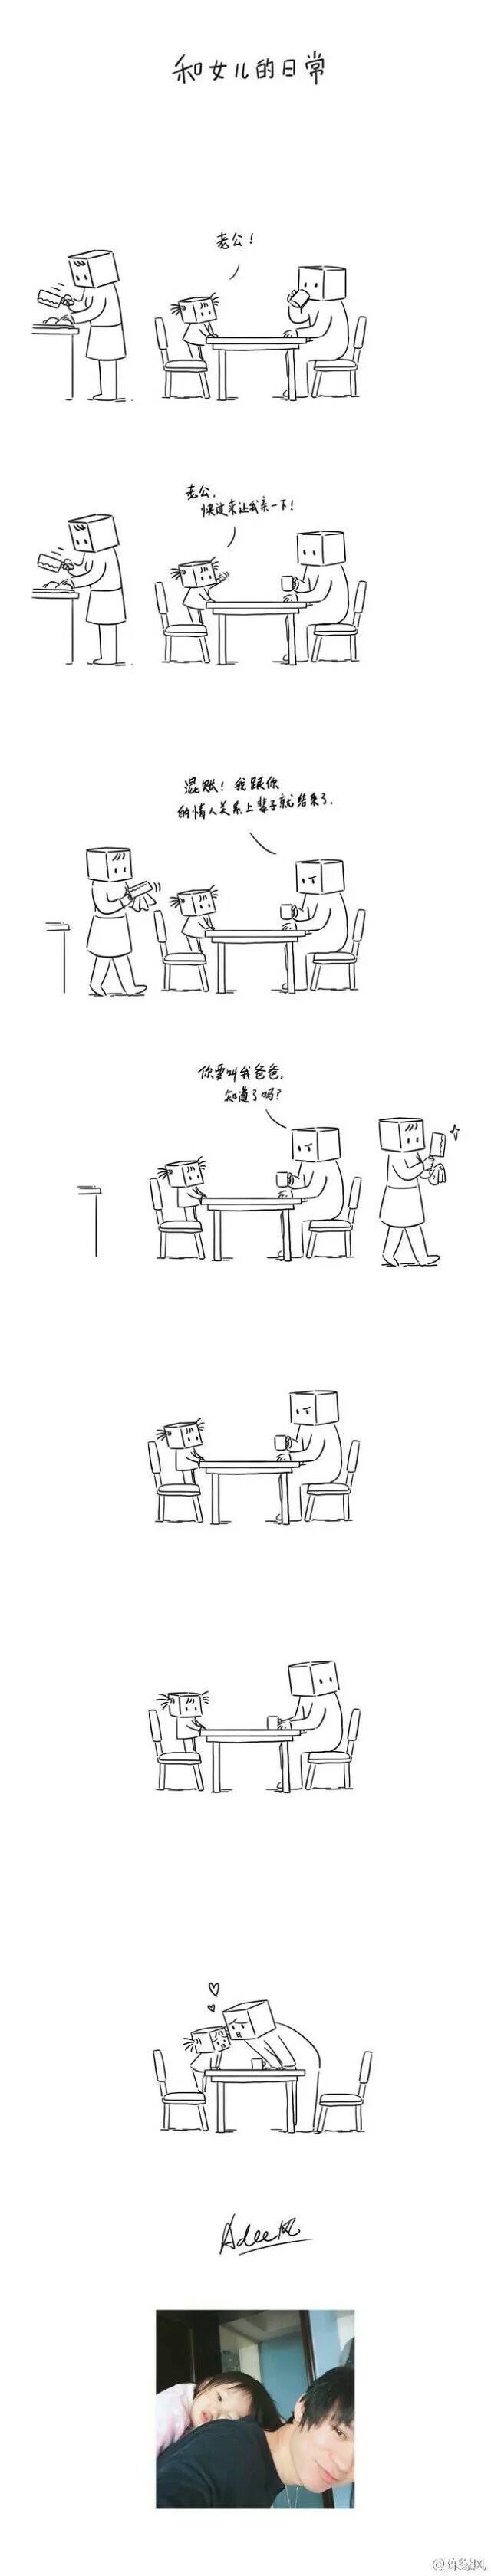 8cda1476679901 - 温馨漫画-《和女儿的日常》